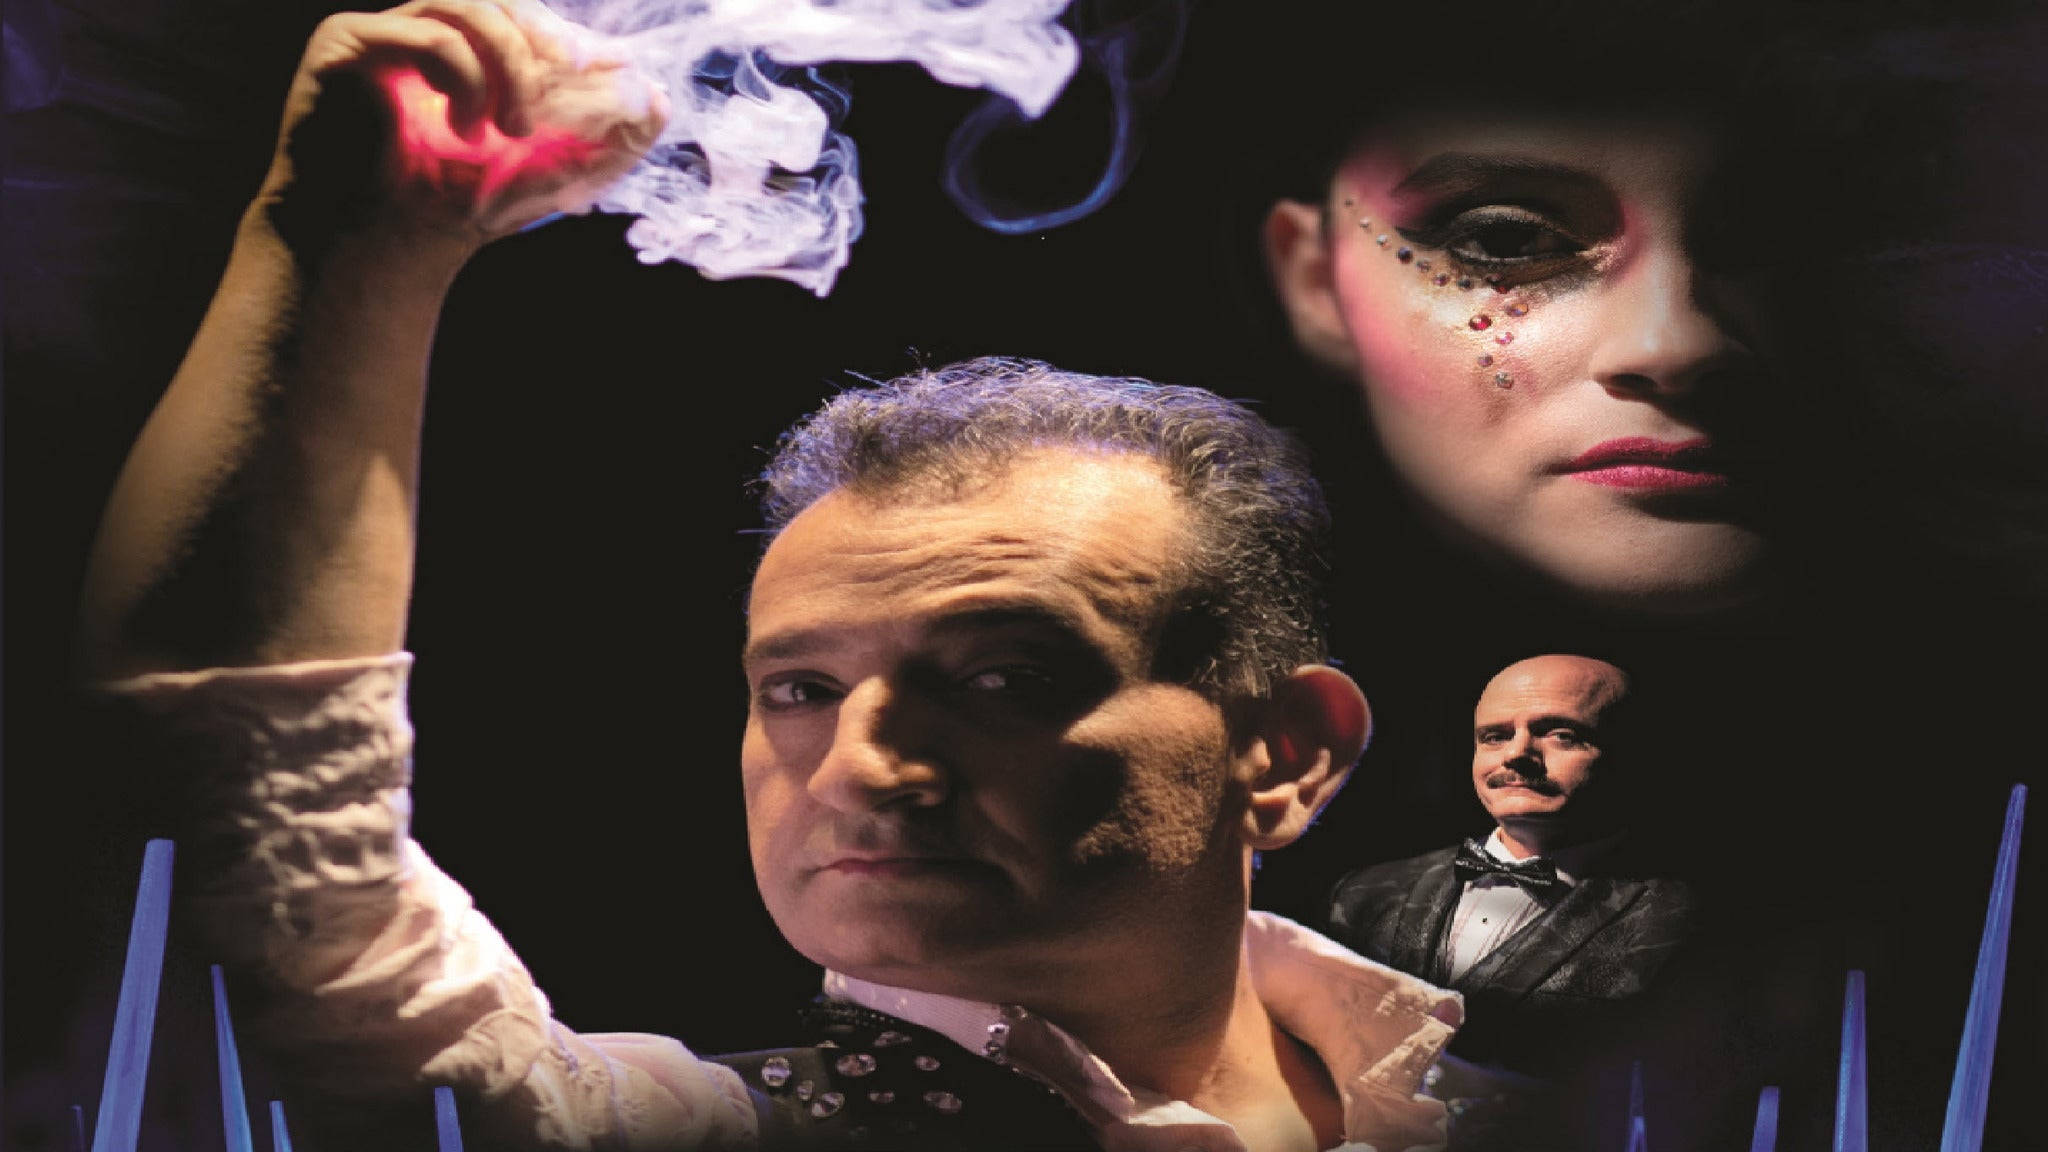 Shahrooz Mystere: Beyond Illusion